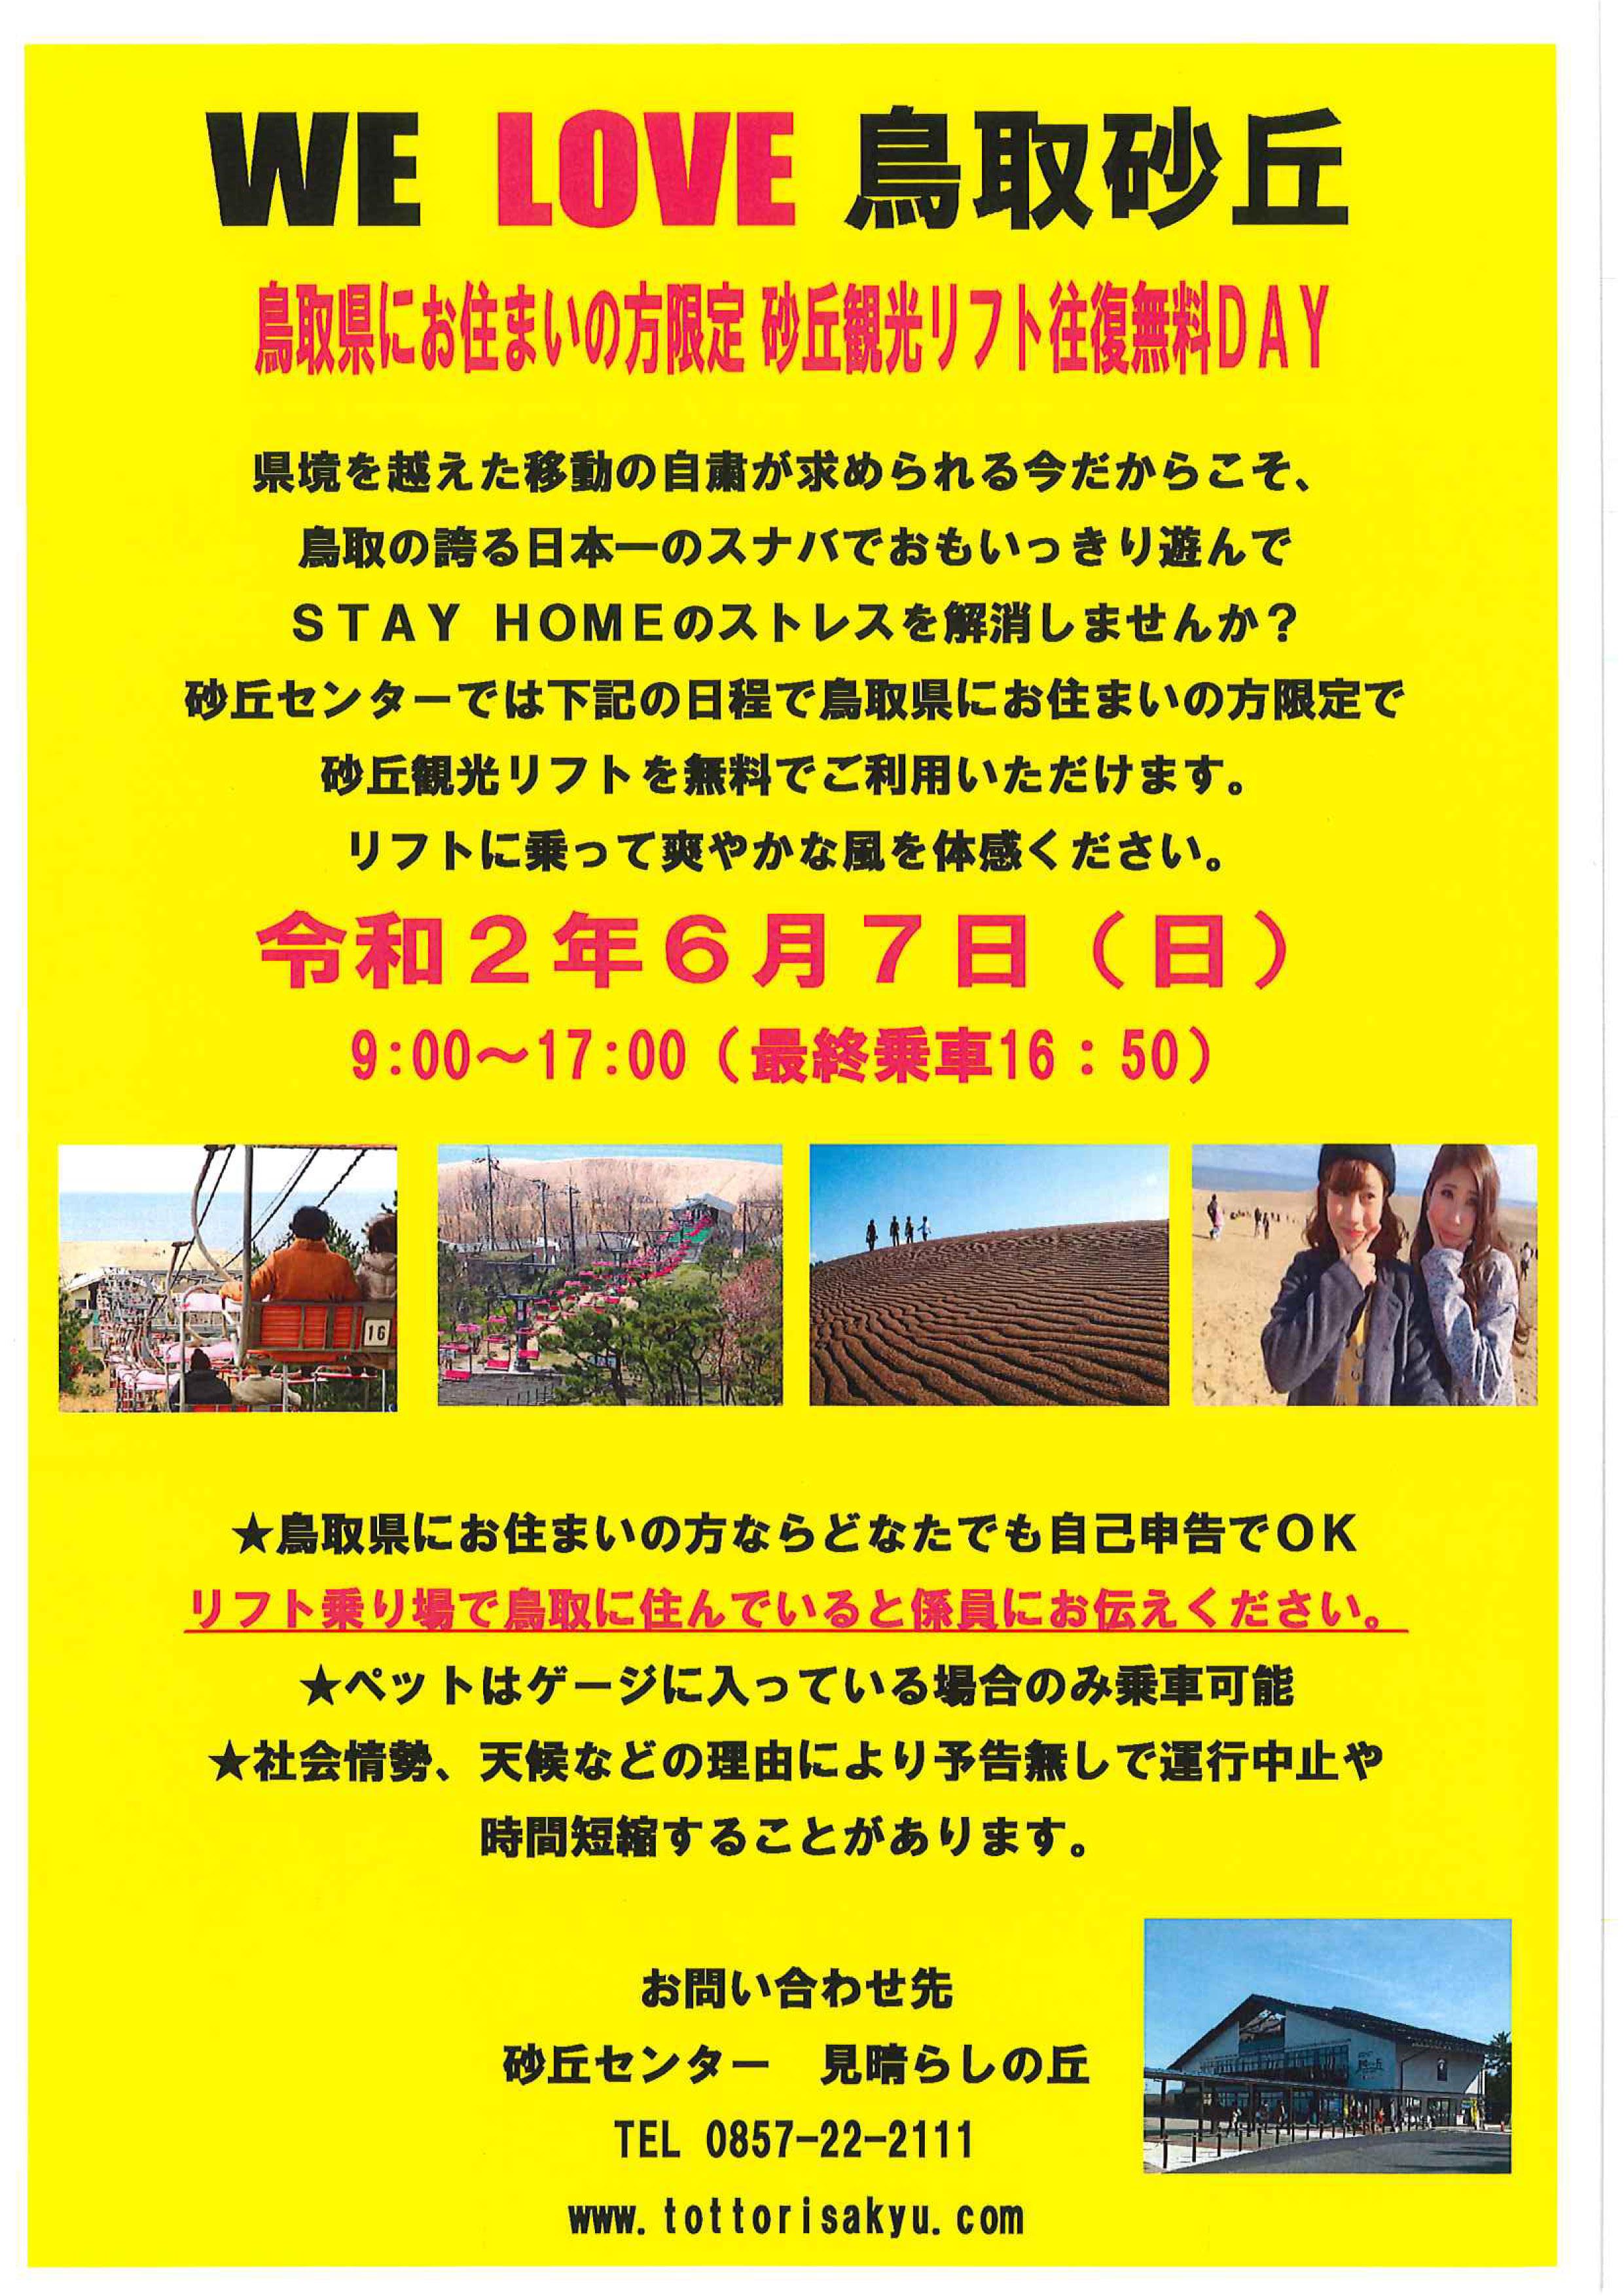 welove鳥取砂丘